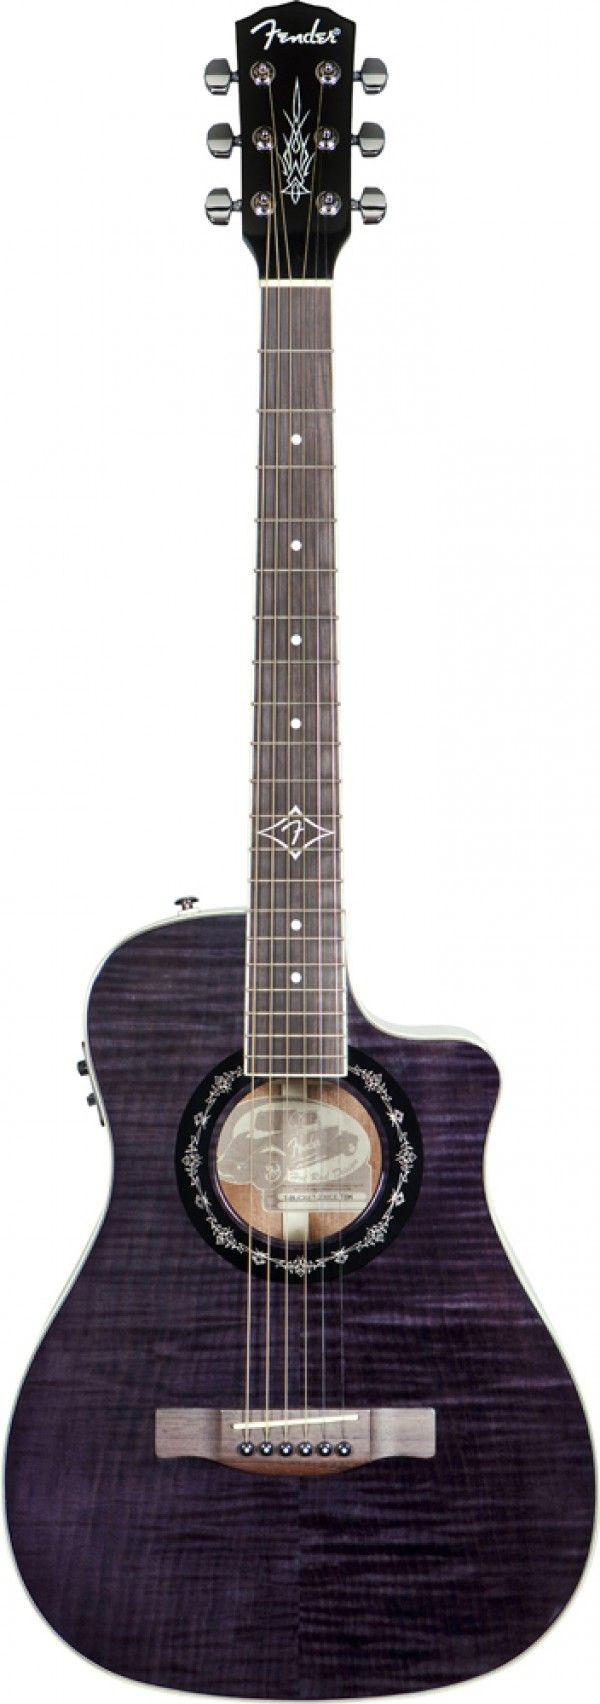 Fender R Hot Rod Design T Bucket Tm Series 200ce Acoustic Electric Guitar Transparent Black 299 99 Acoustic Electric Guitar Acoustic Electric Guitar